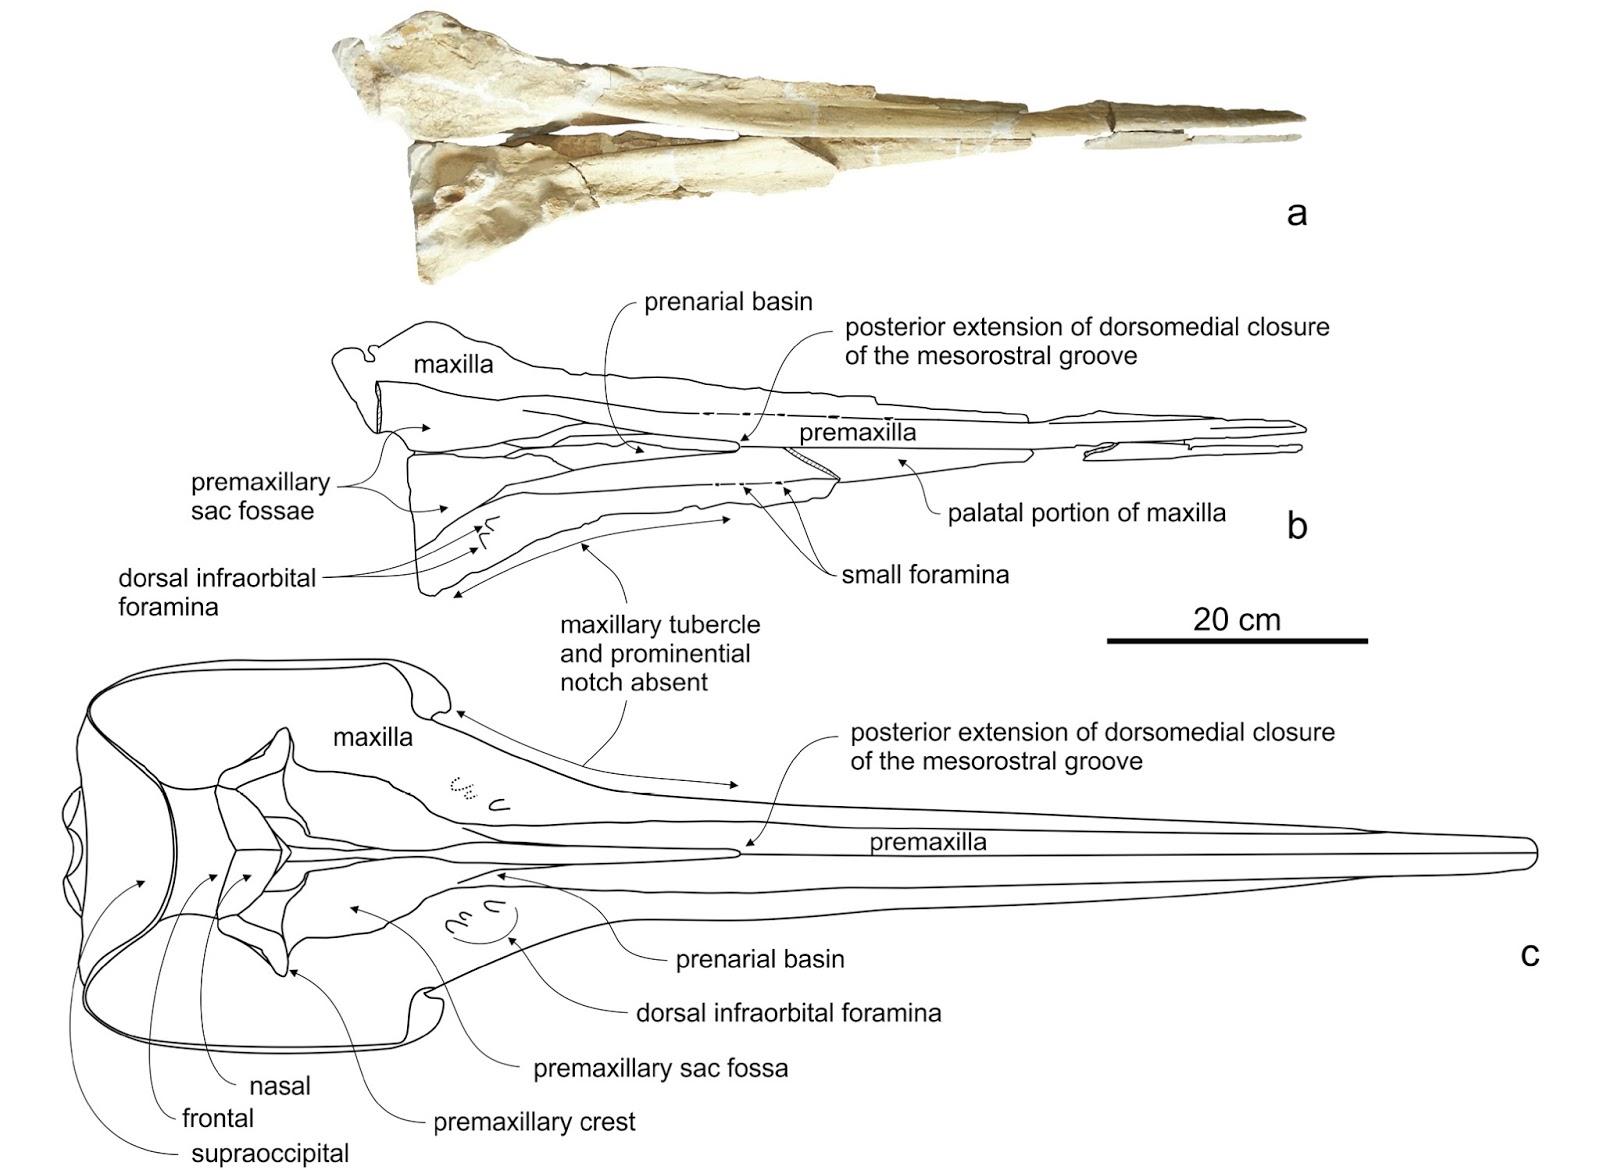 The Coastal Paleontologist, atlantic edition: January 2017